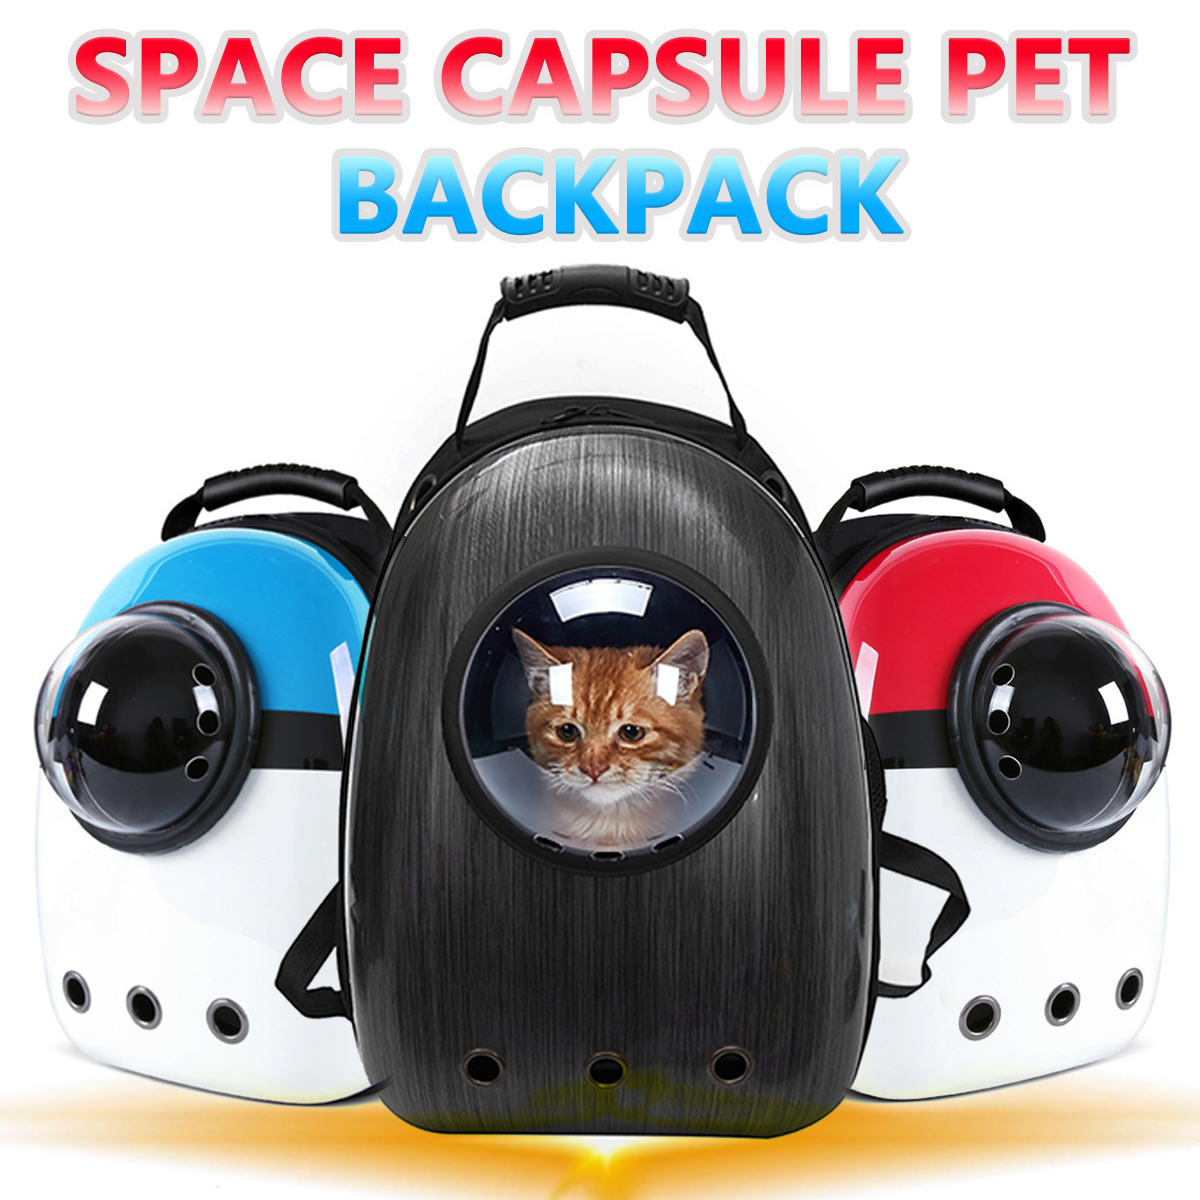 Pet Dog Cat backpack Travel cat carrier Double Shoulder Bag Space Capsule Cat Backpack for Bag Small Pet Handbag Cat carrying